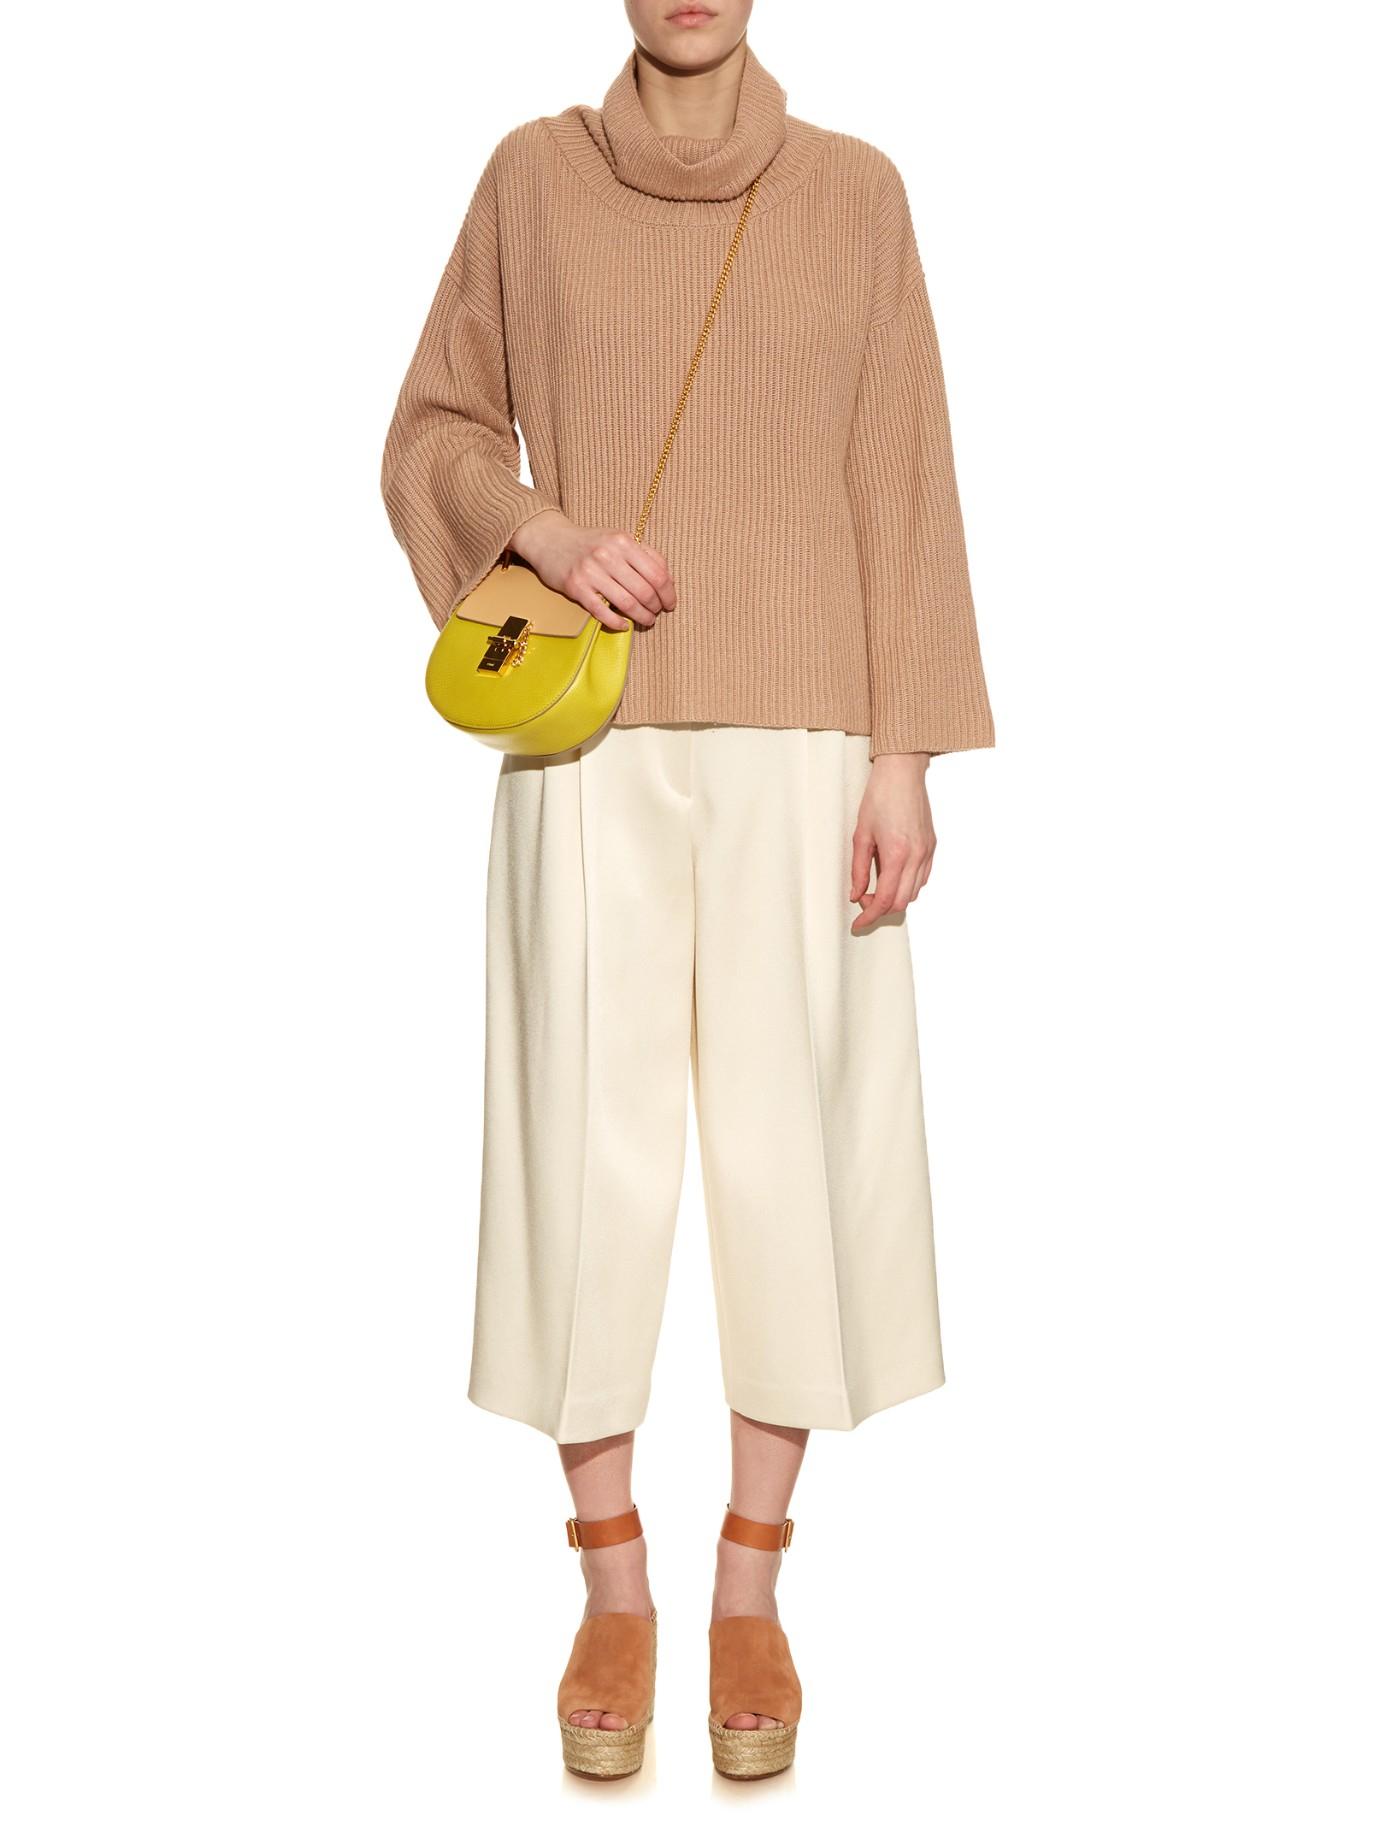 imitation chloe handbags - chloe drew small embellished leather crossbody bag, how to tell a ...